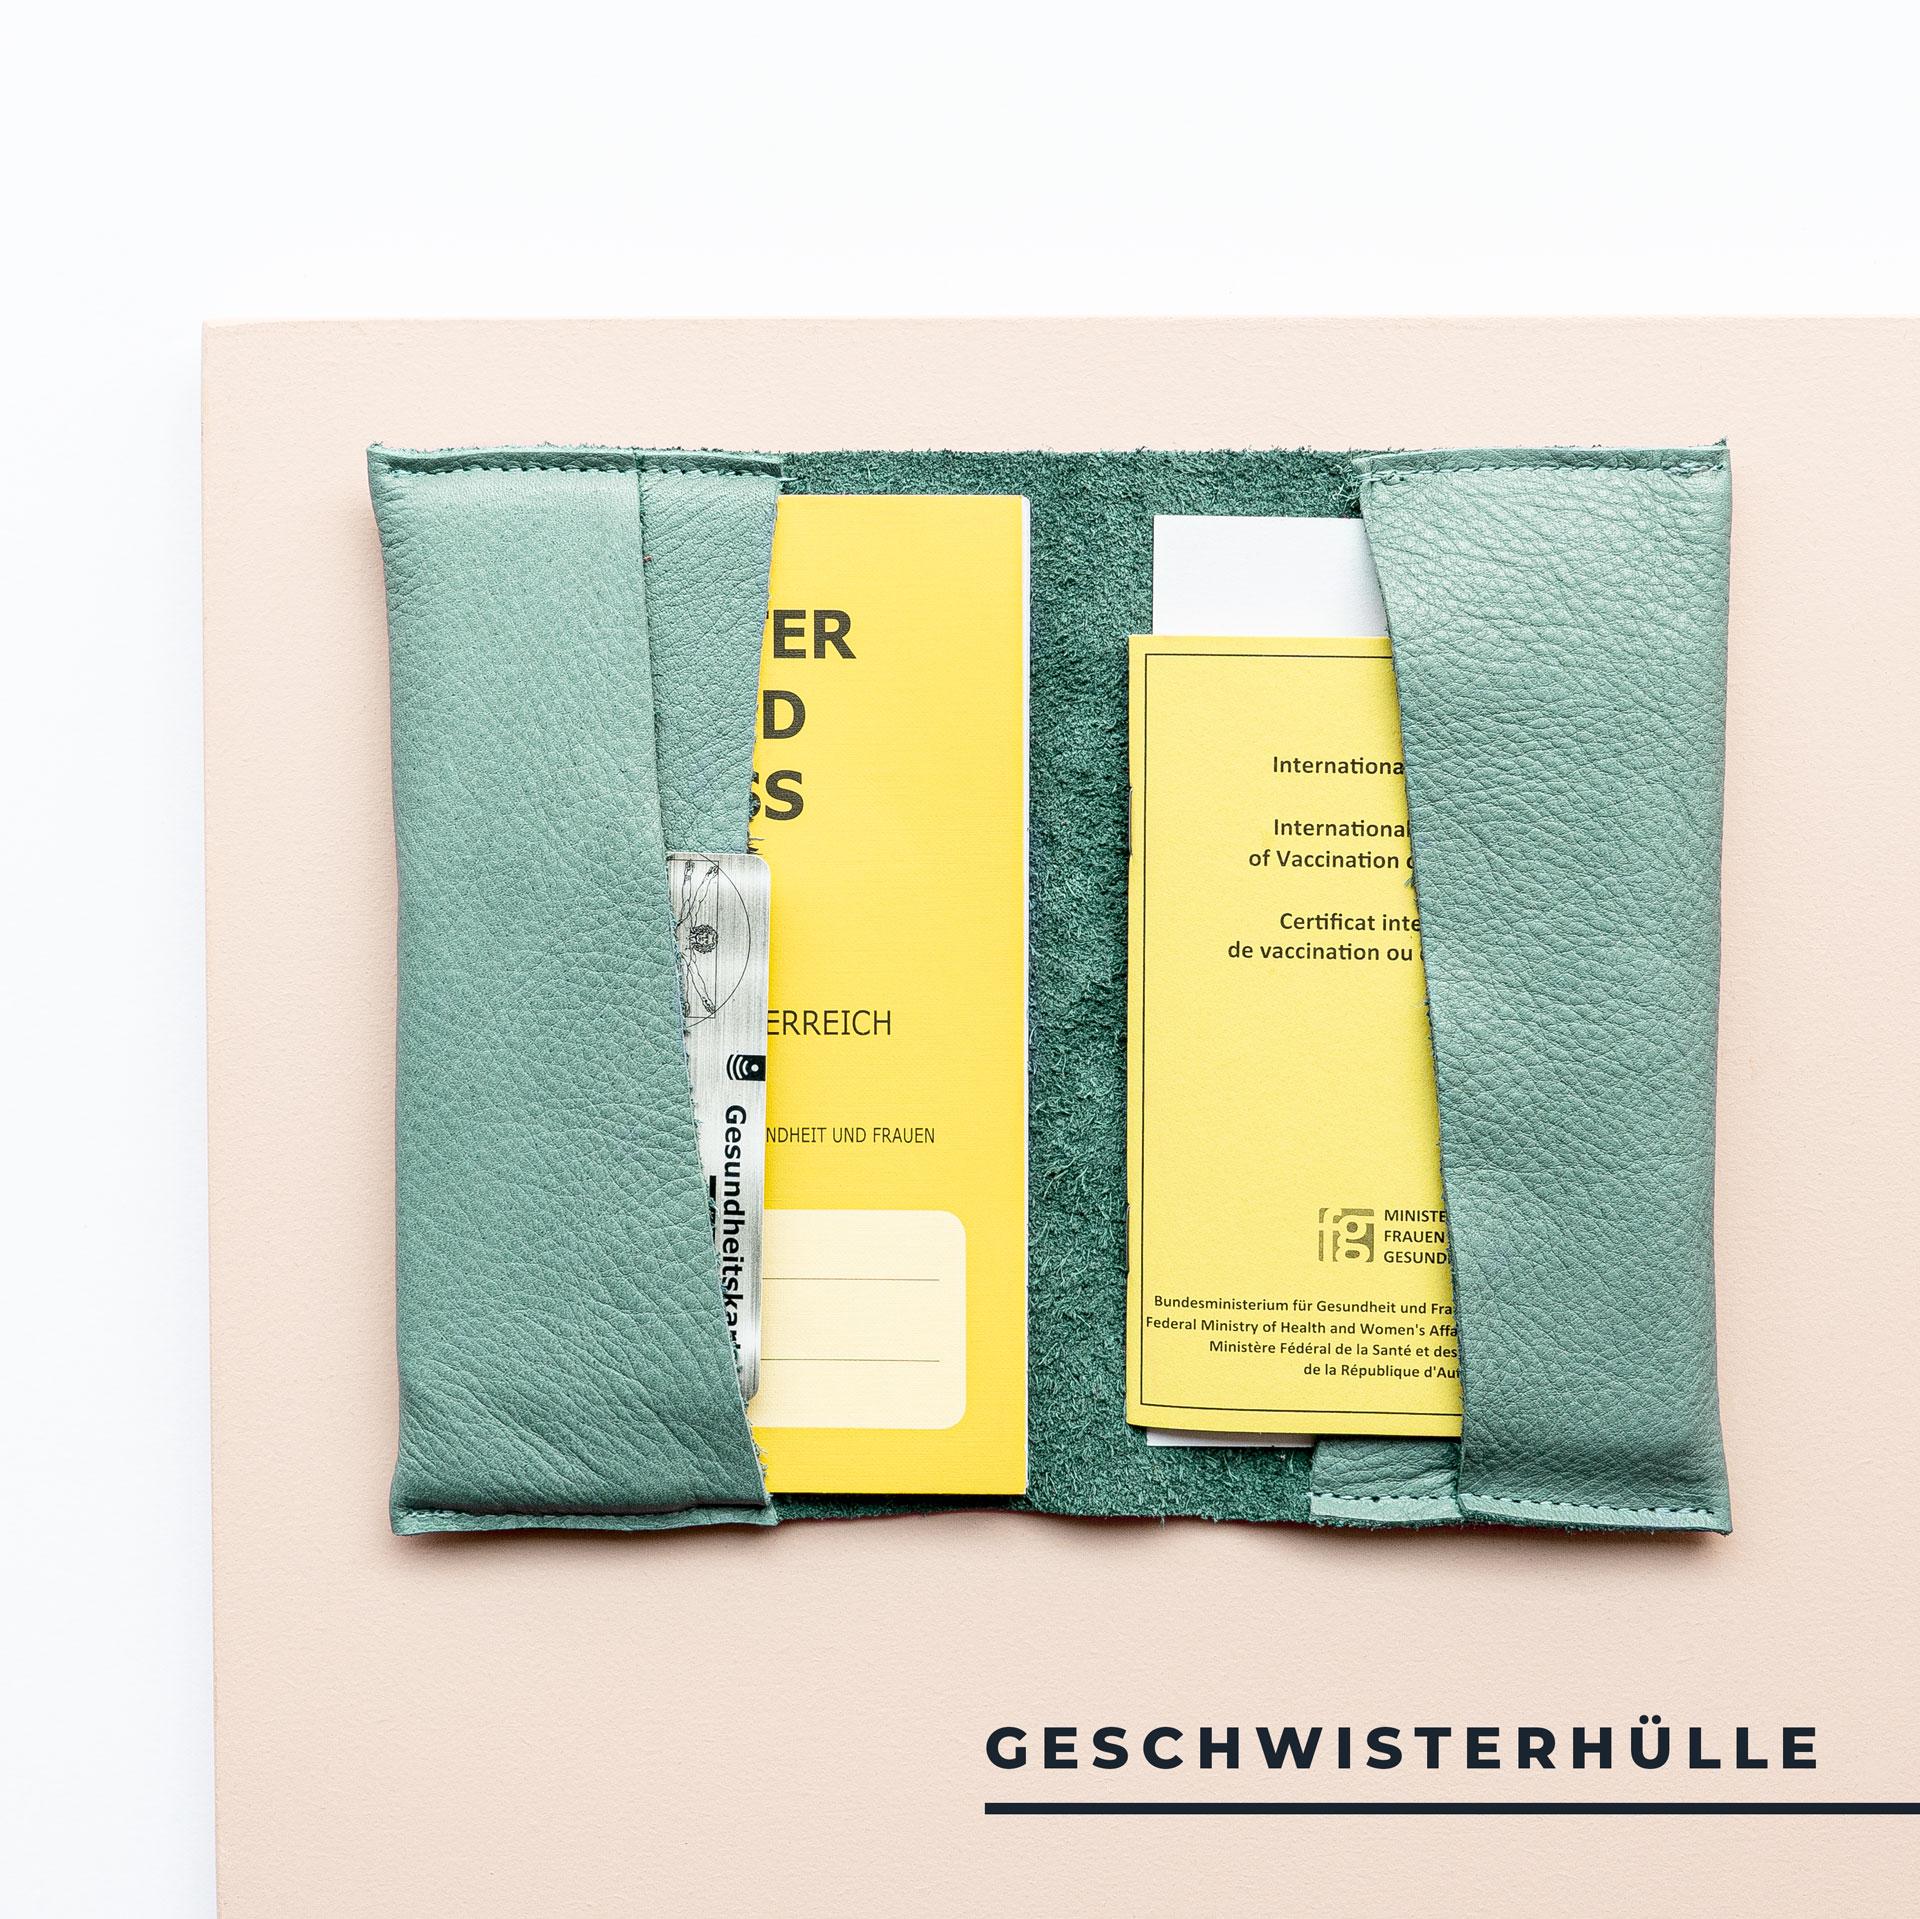 Mutter-Kind-Pass-Huelle-Oesterreich-Naturleder-Franziska-Klee-mint-geschwisterhuelle